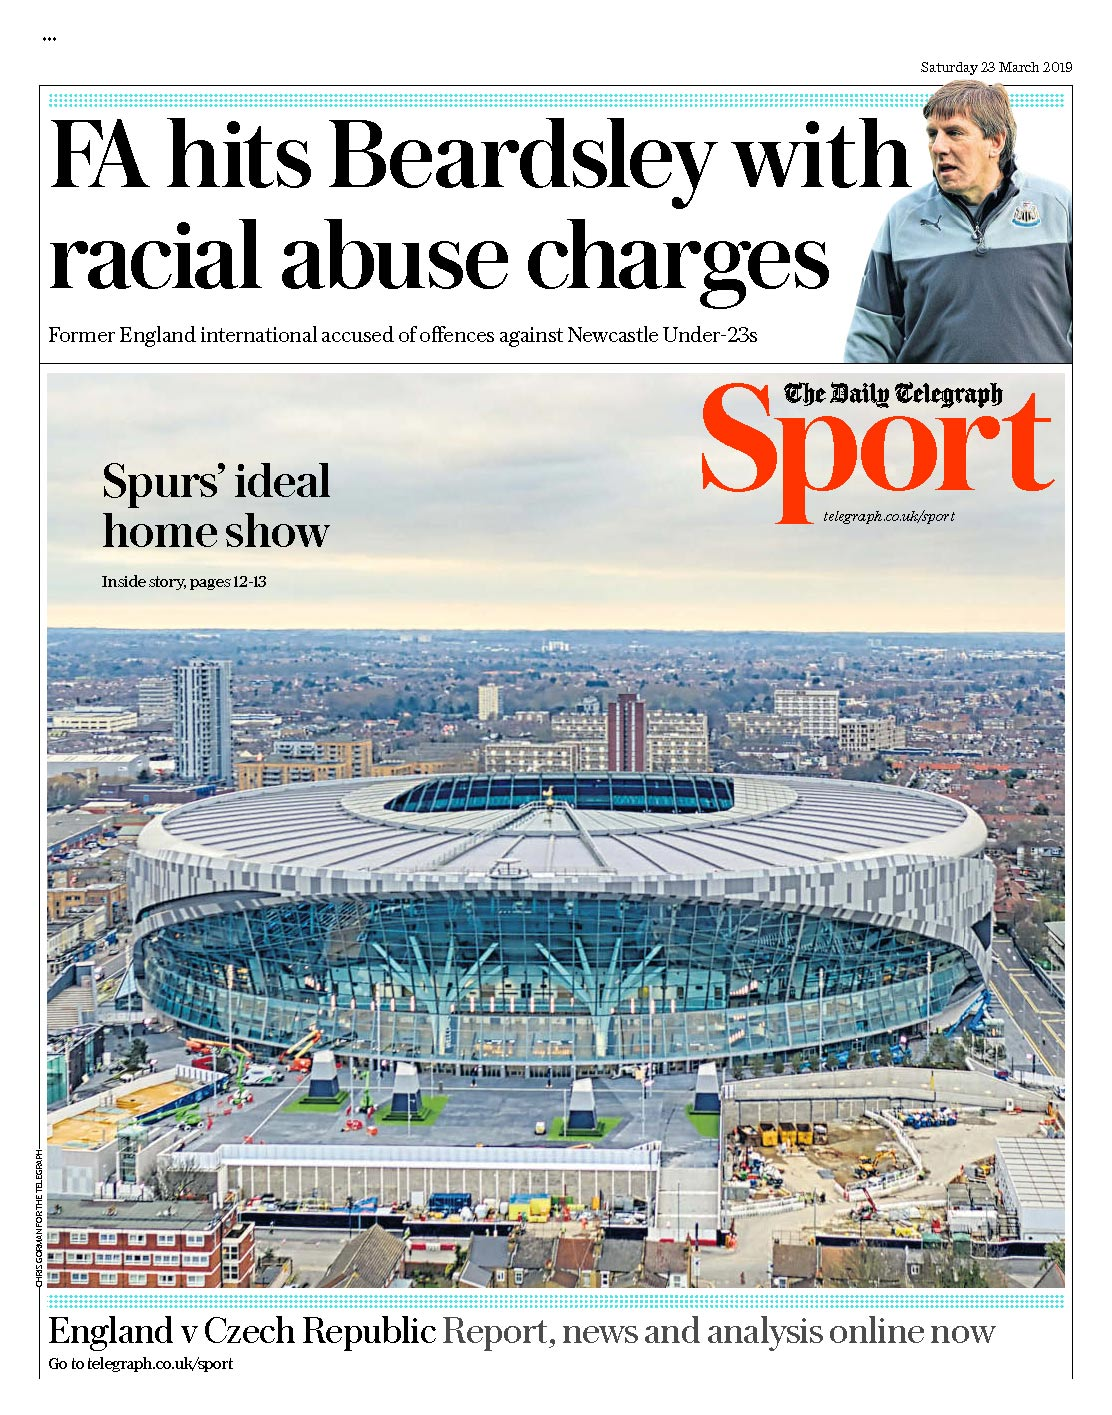 Daily Telegraph - Sport